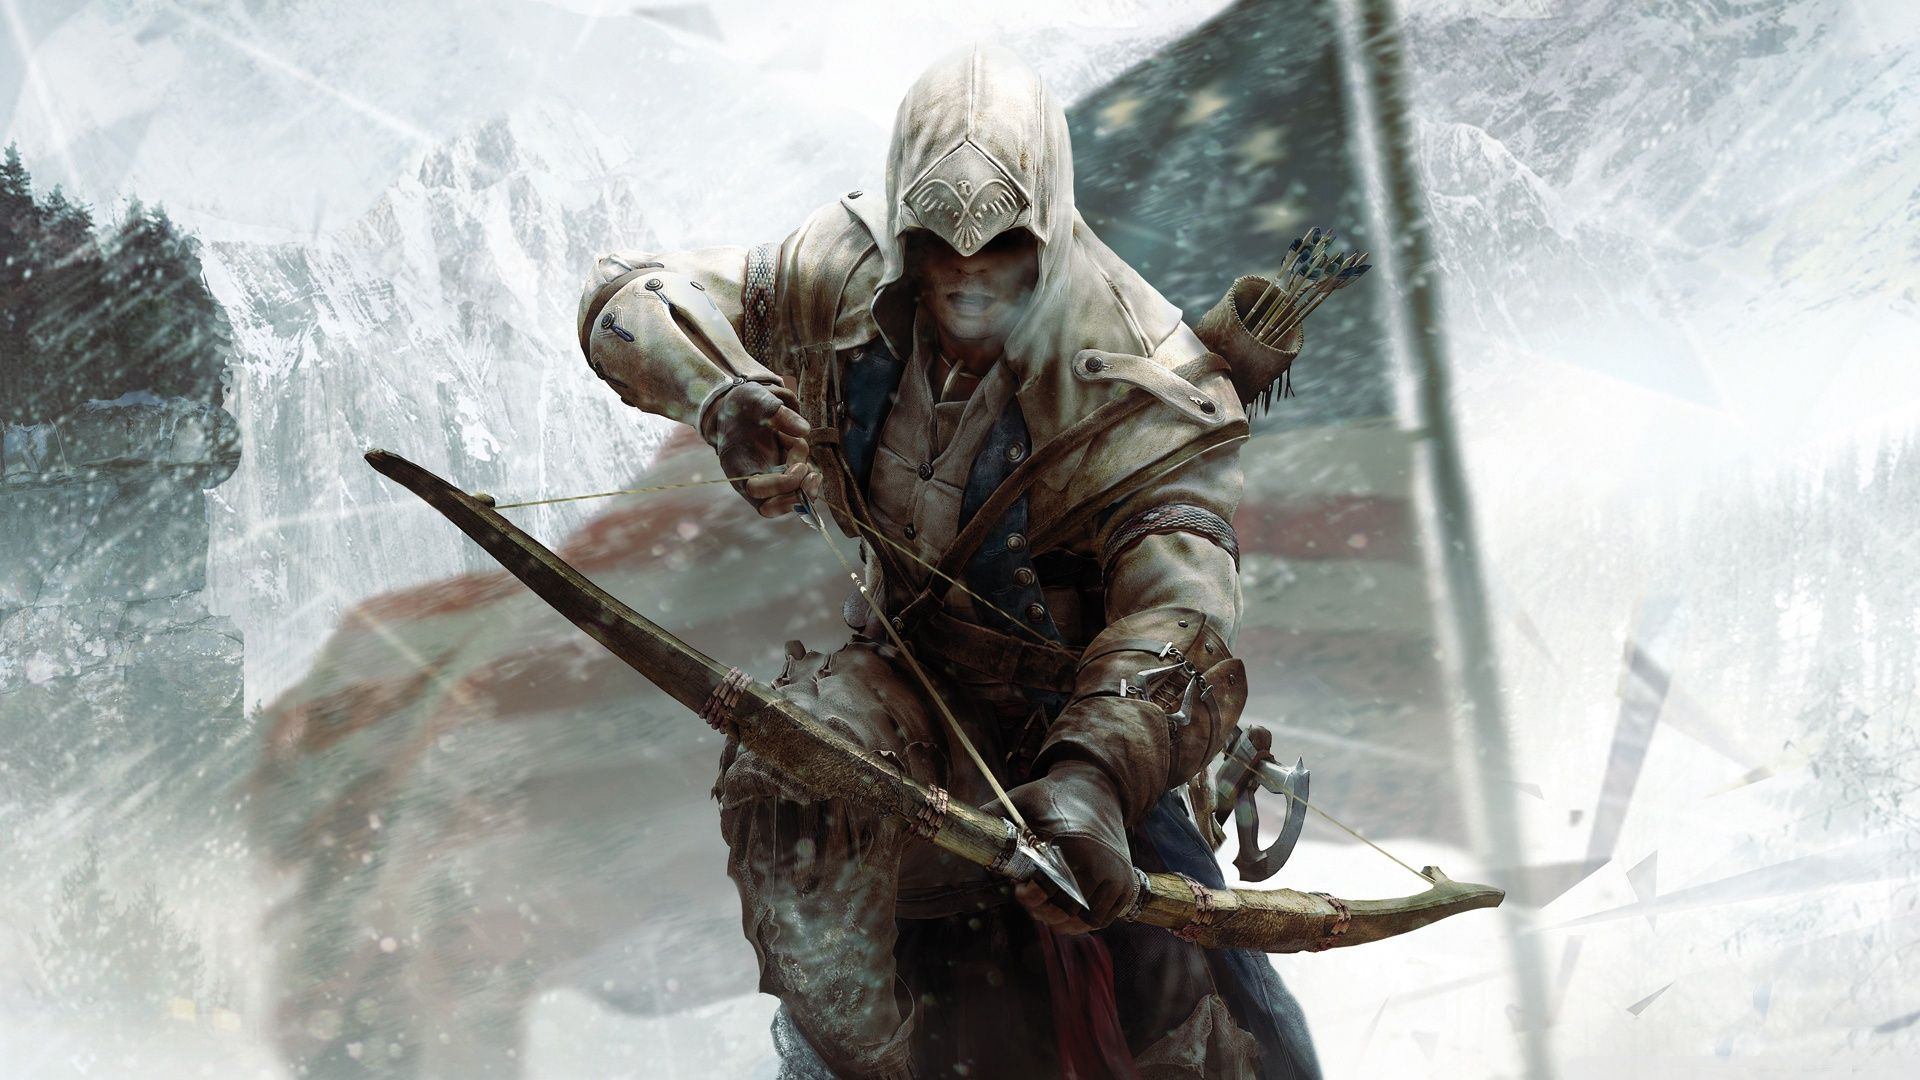 assassins_creed_3_connor_bow-wallpaper-1920x1080.jpg (1920×1080) | Assassins creed, Assassins creed 3, Assassin's creed wallpaper